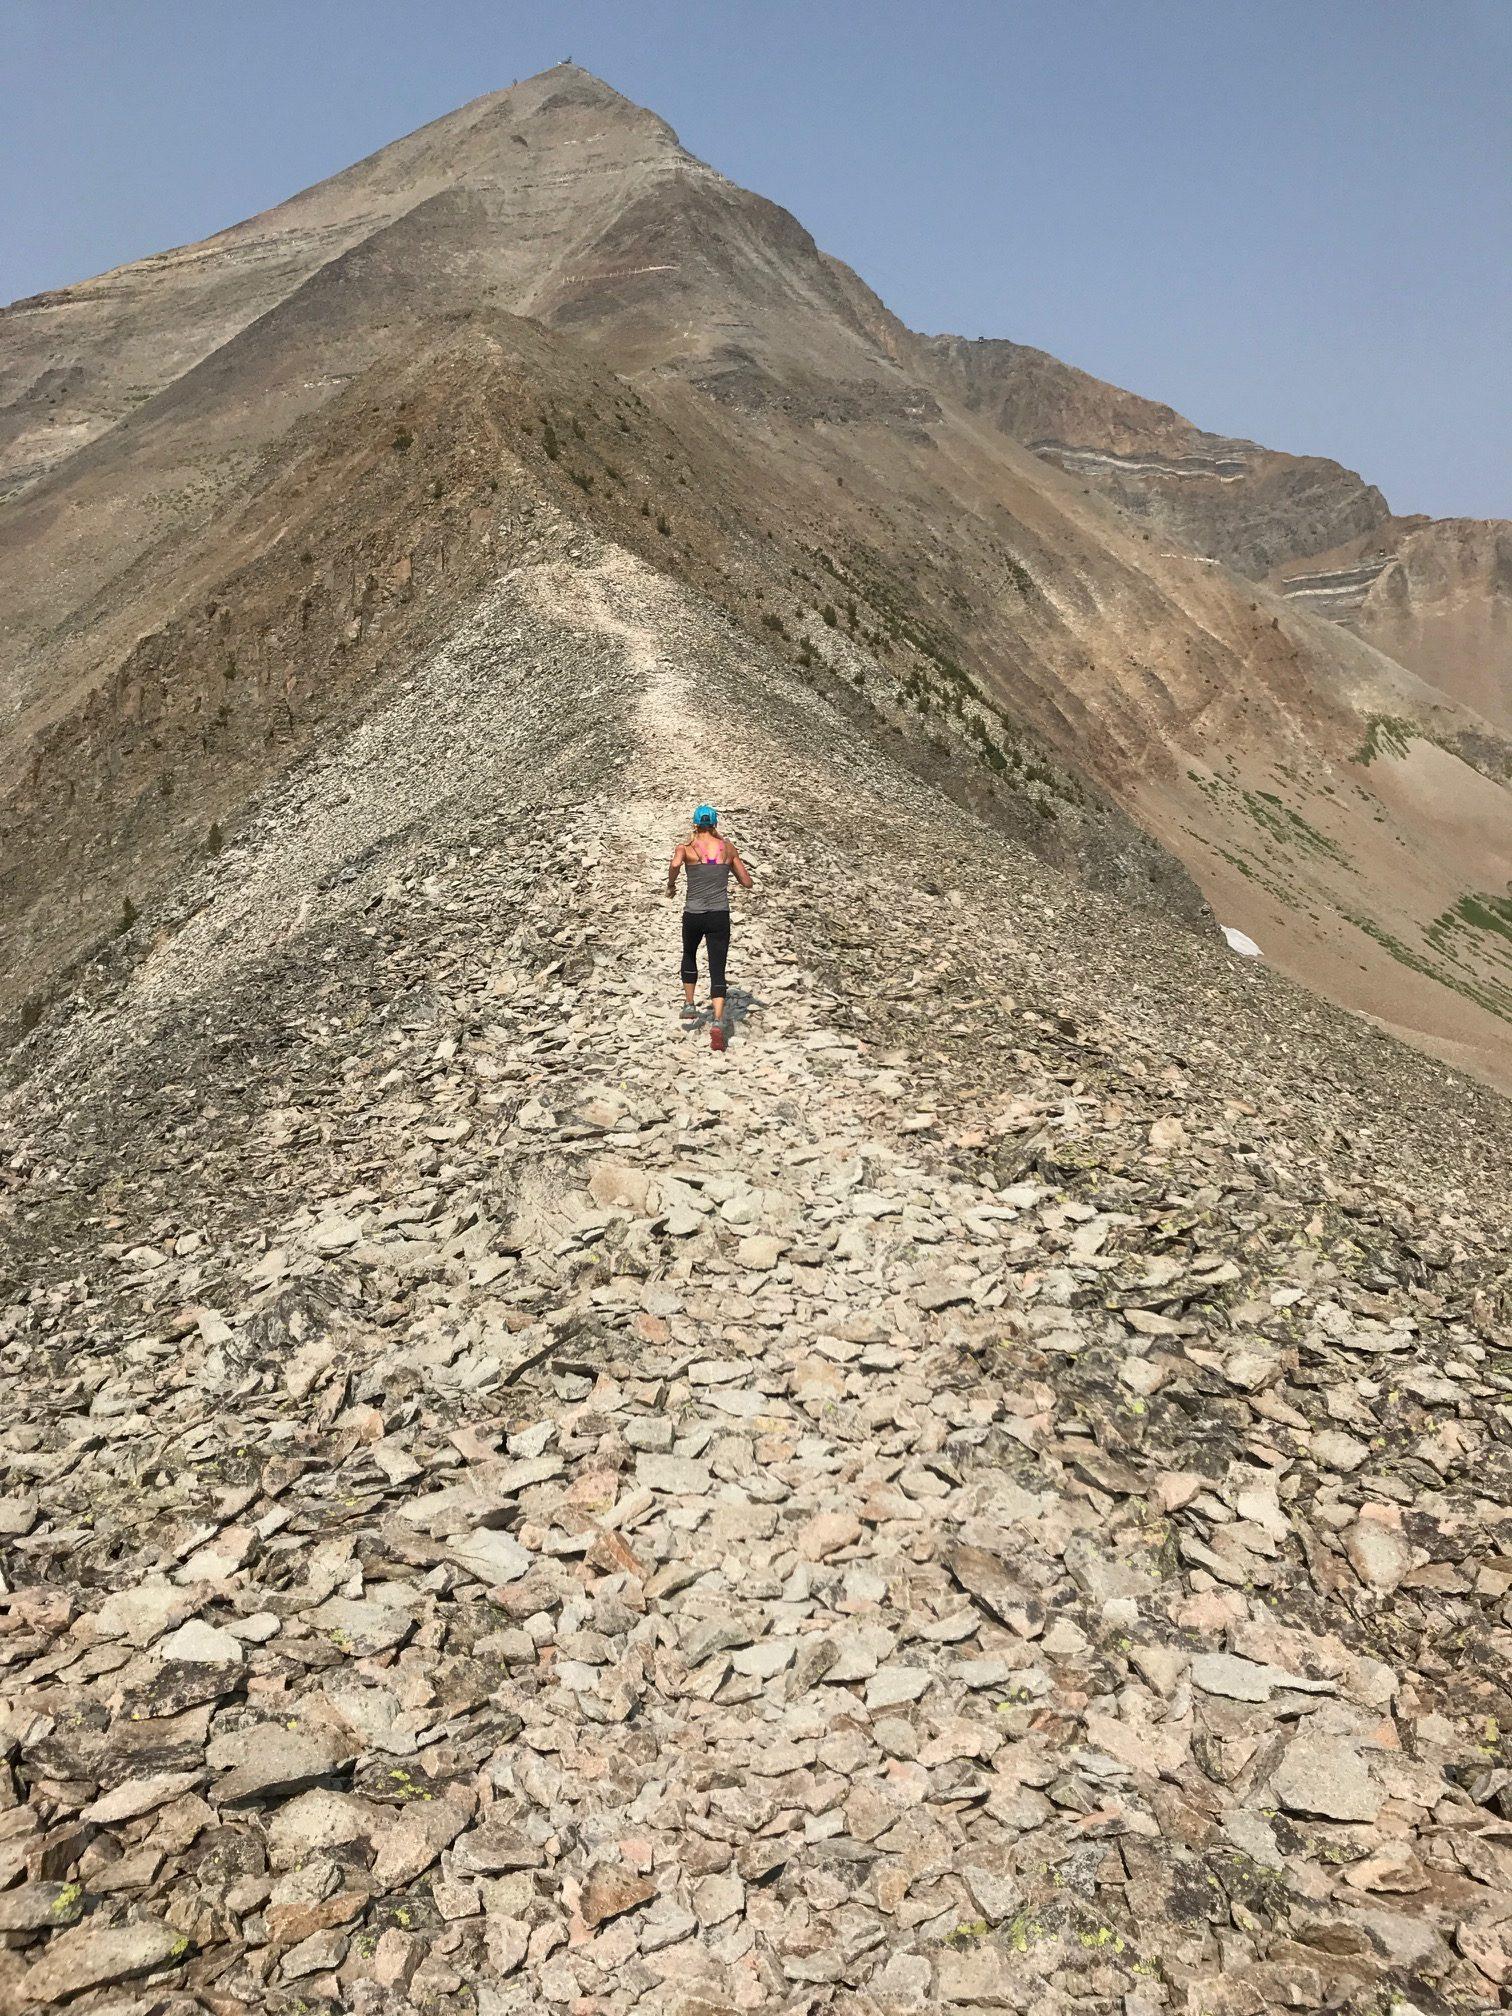 Training time on Lone Peak